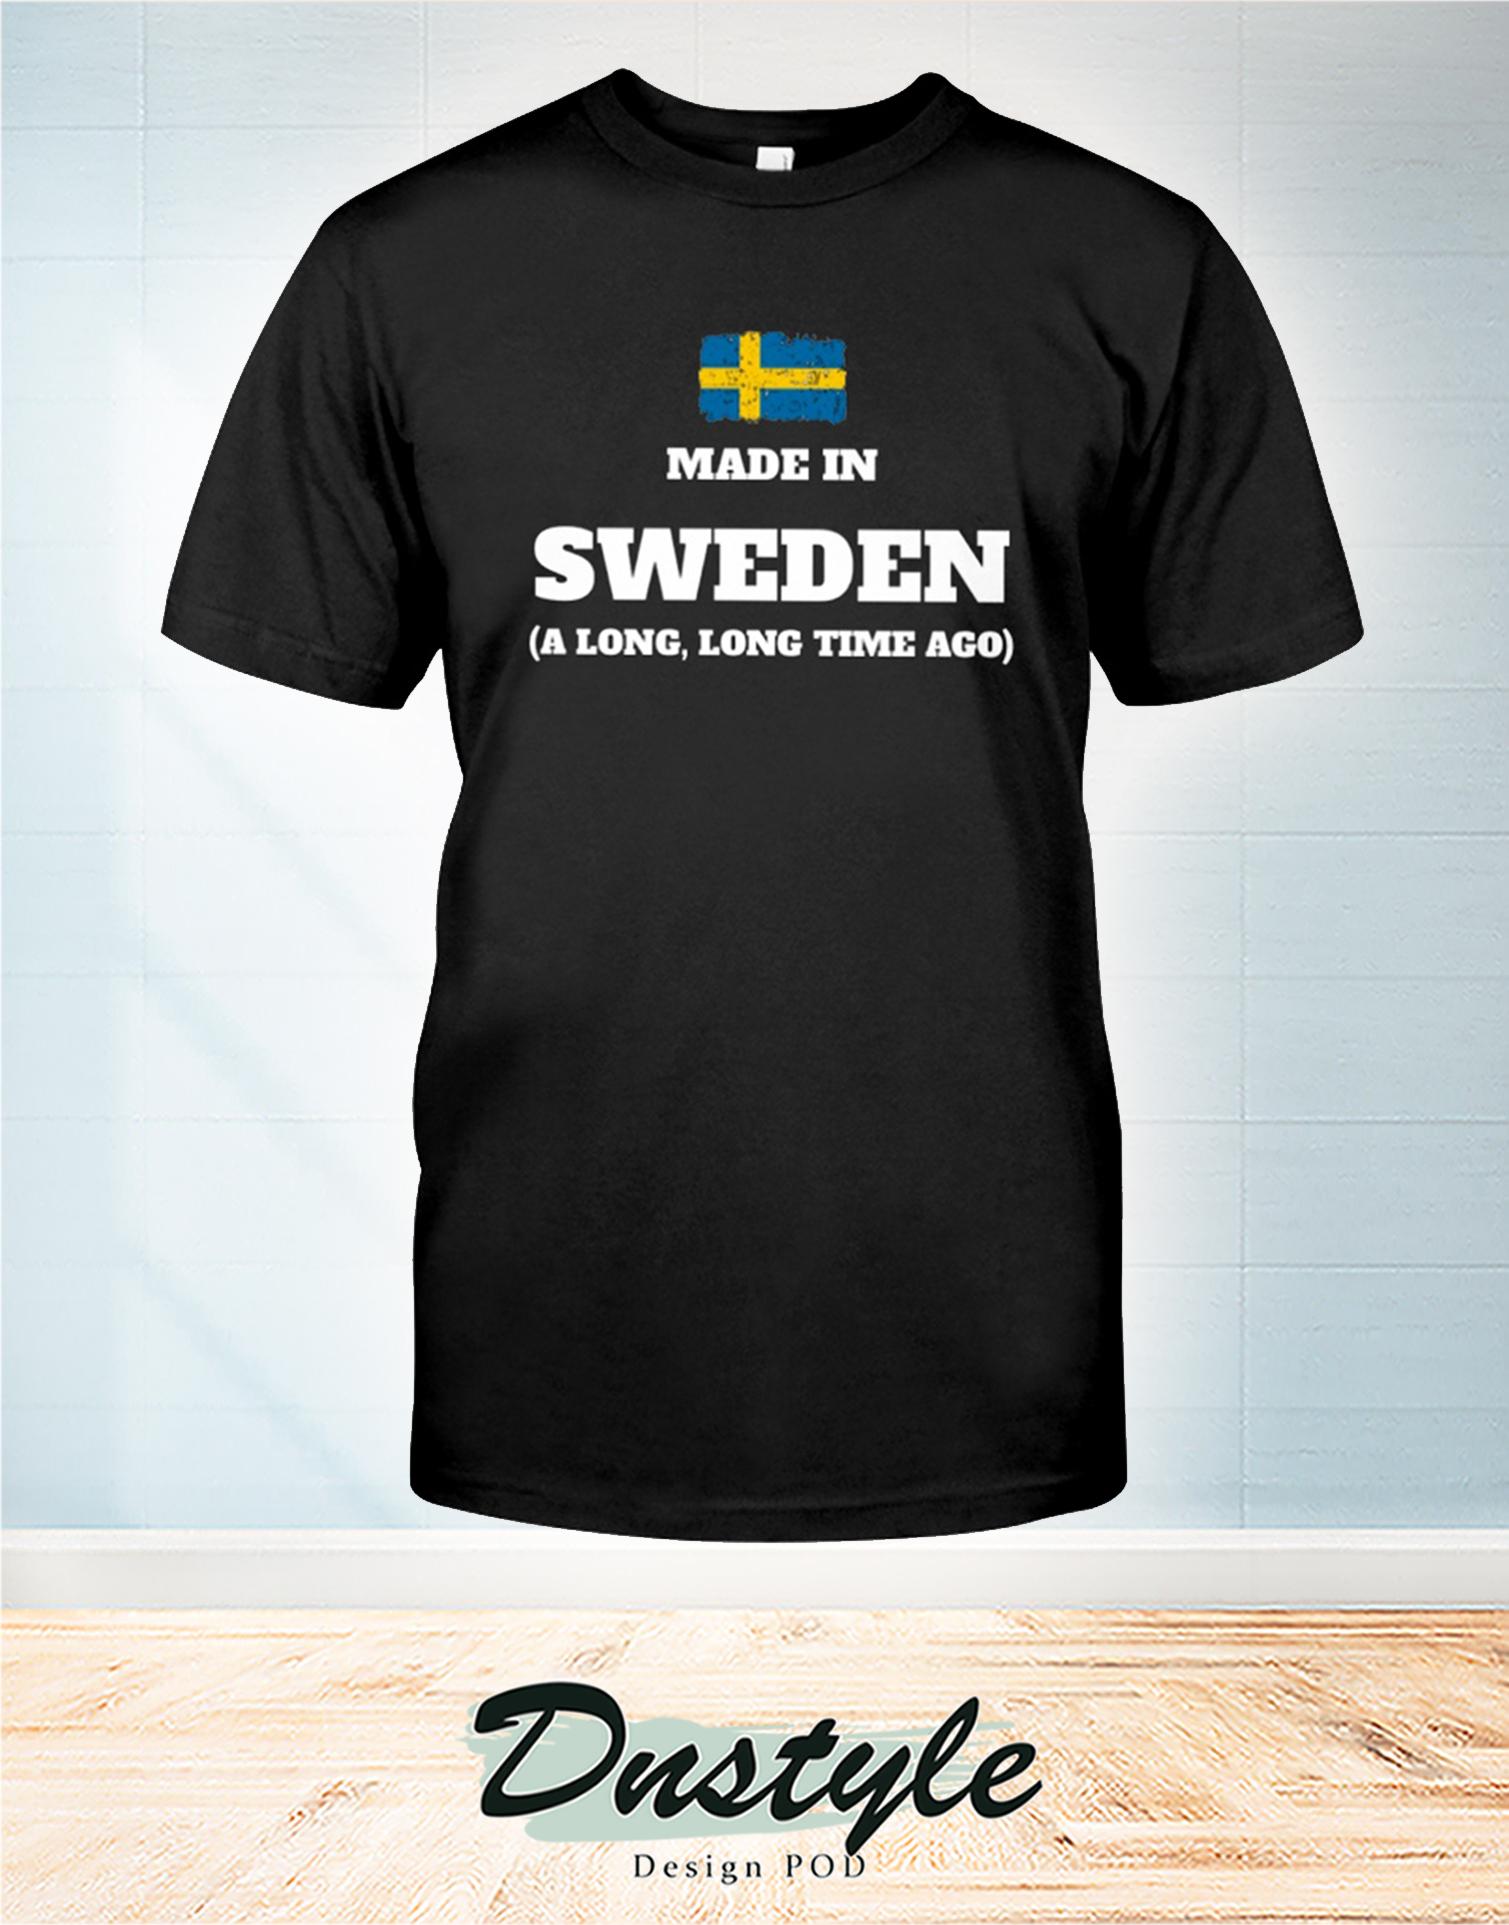 Made in sweaden a long long time ago t-shirt